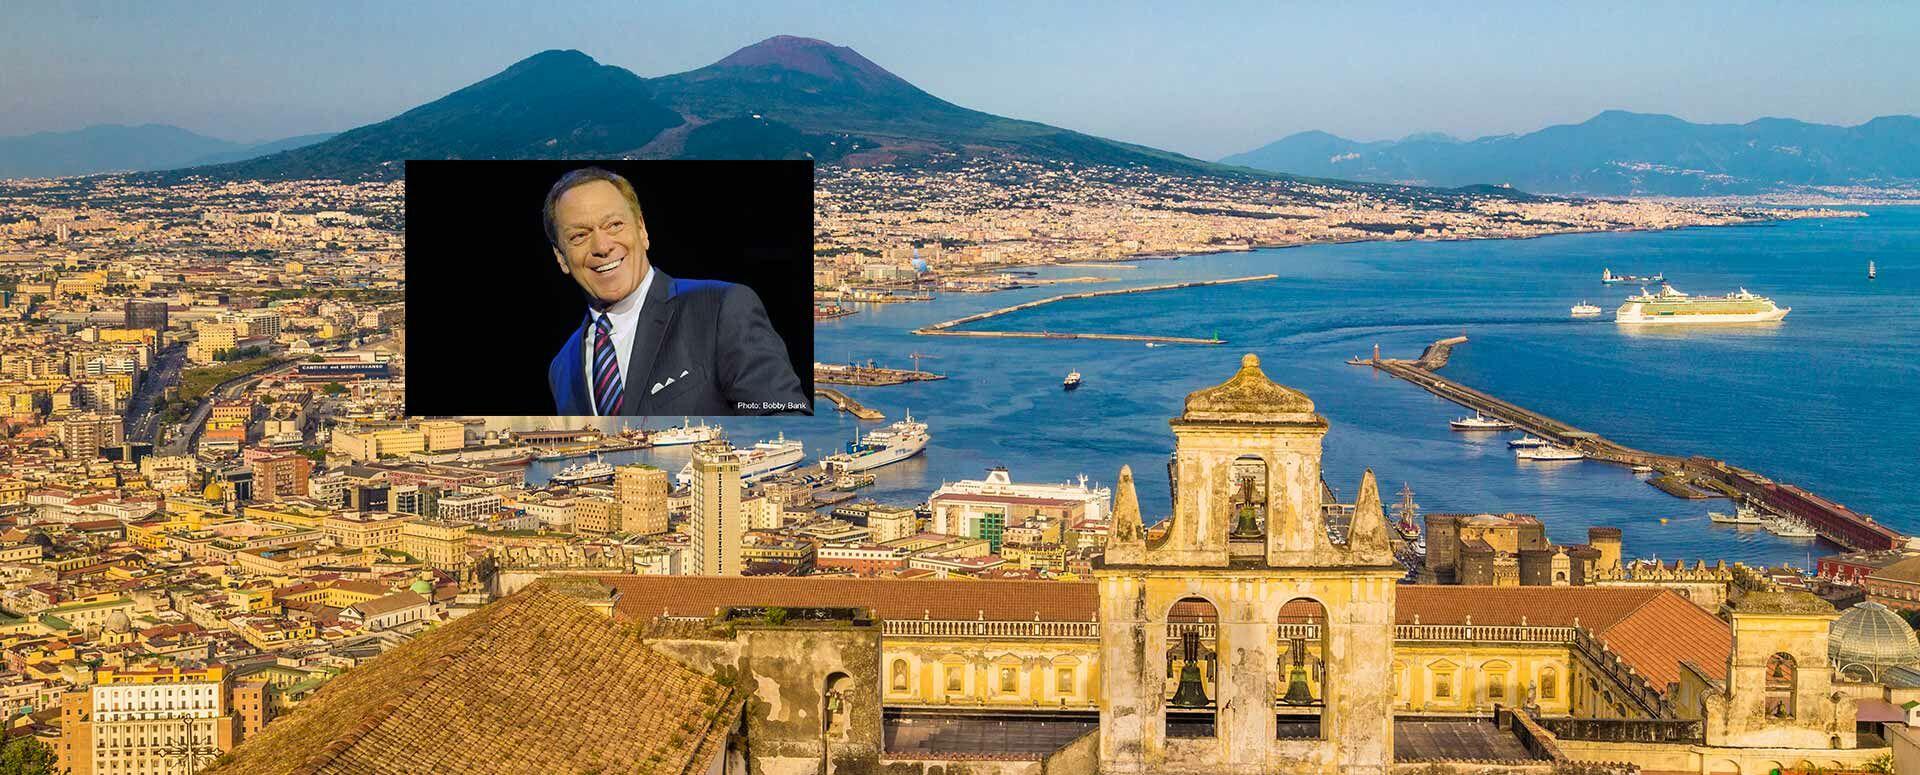 Join Joe Piscopo on a Special Perillo Tour!